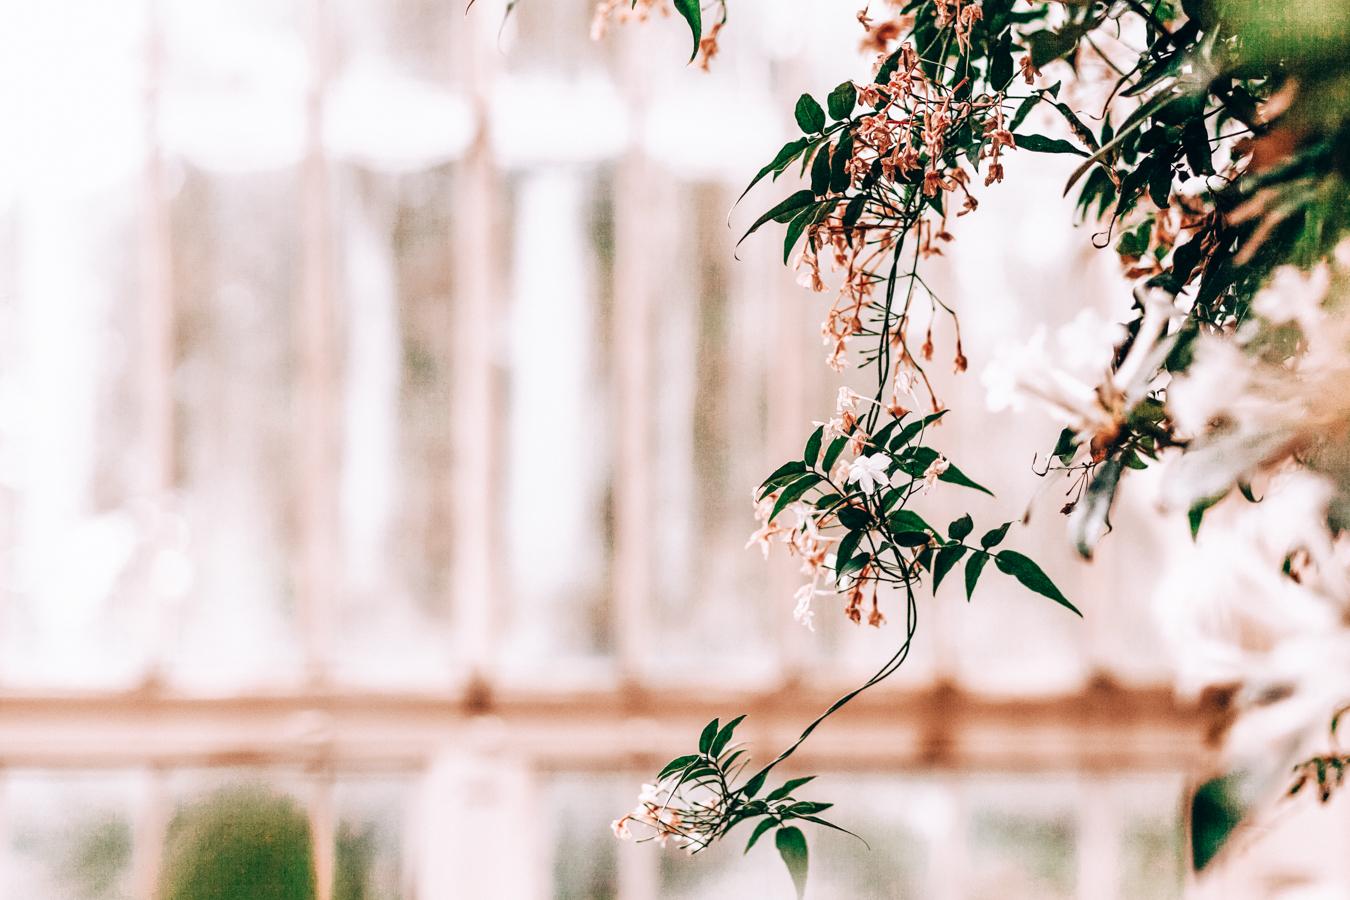 Nature at the National Botanic Gardens